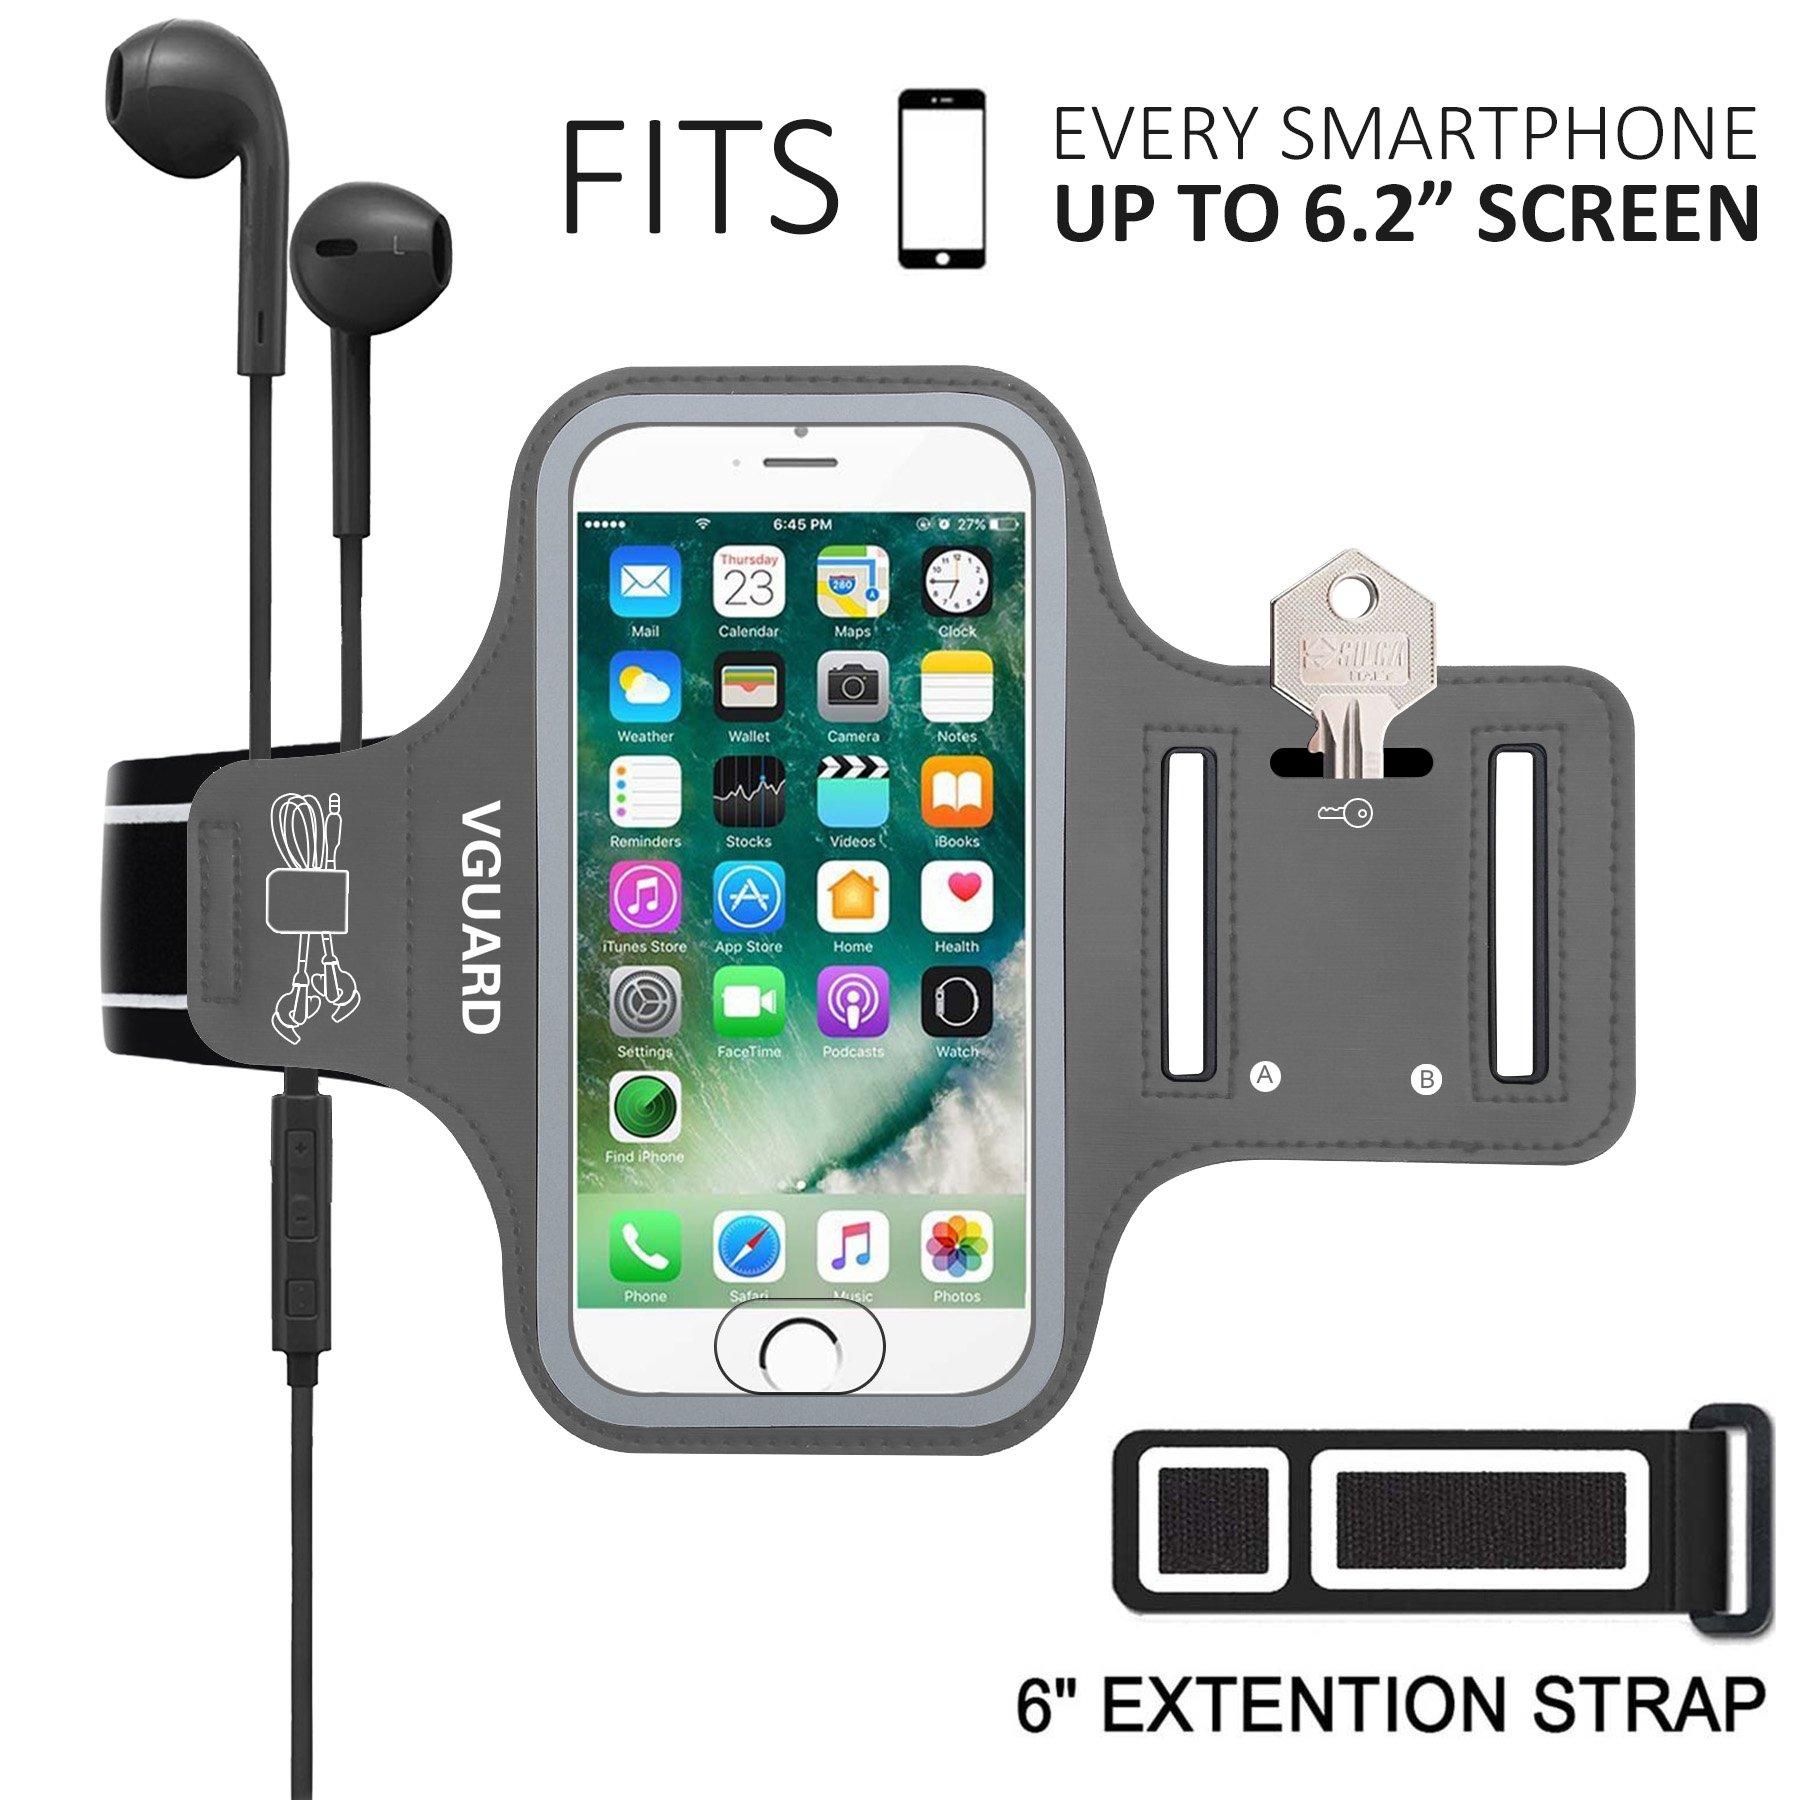 VGUARD Brazalete Deportivo para 6.2 Pulgados iPhone X/8 Plus/7 Plus [ID